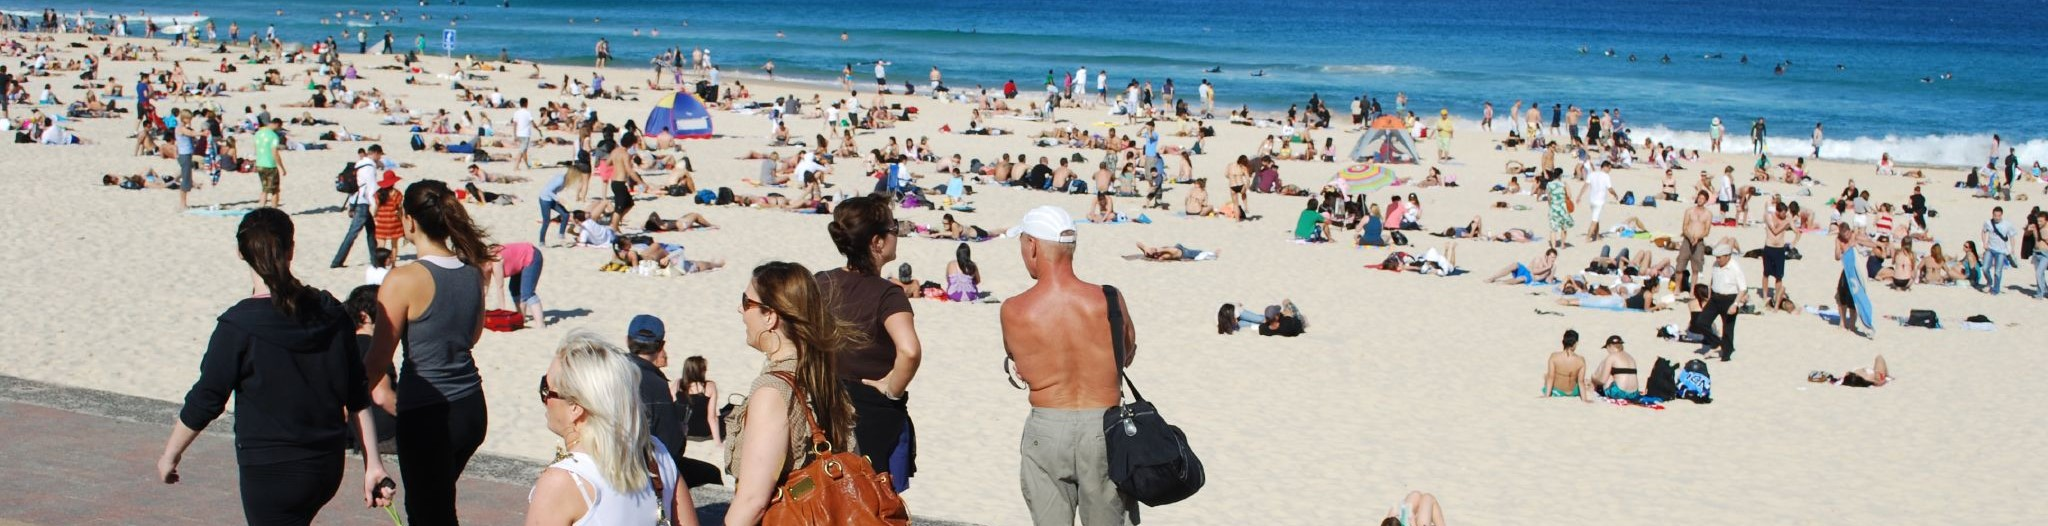 Bondi Beach (Photo: Flickr/Alpha)